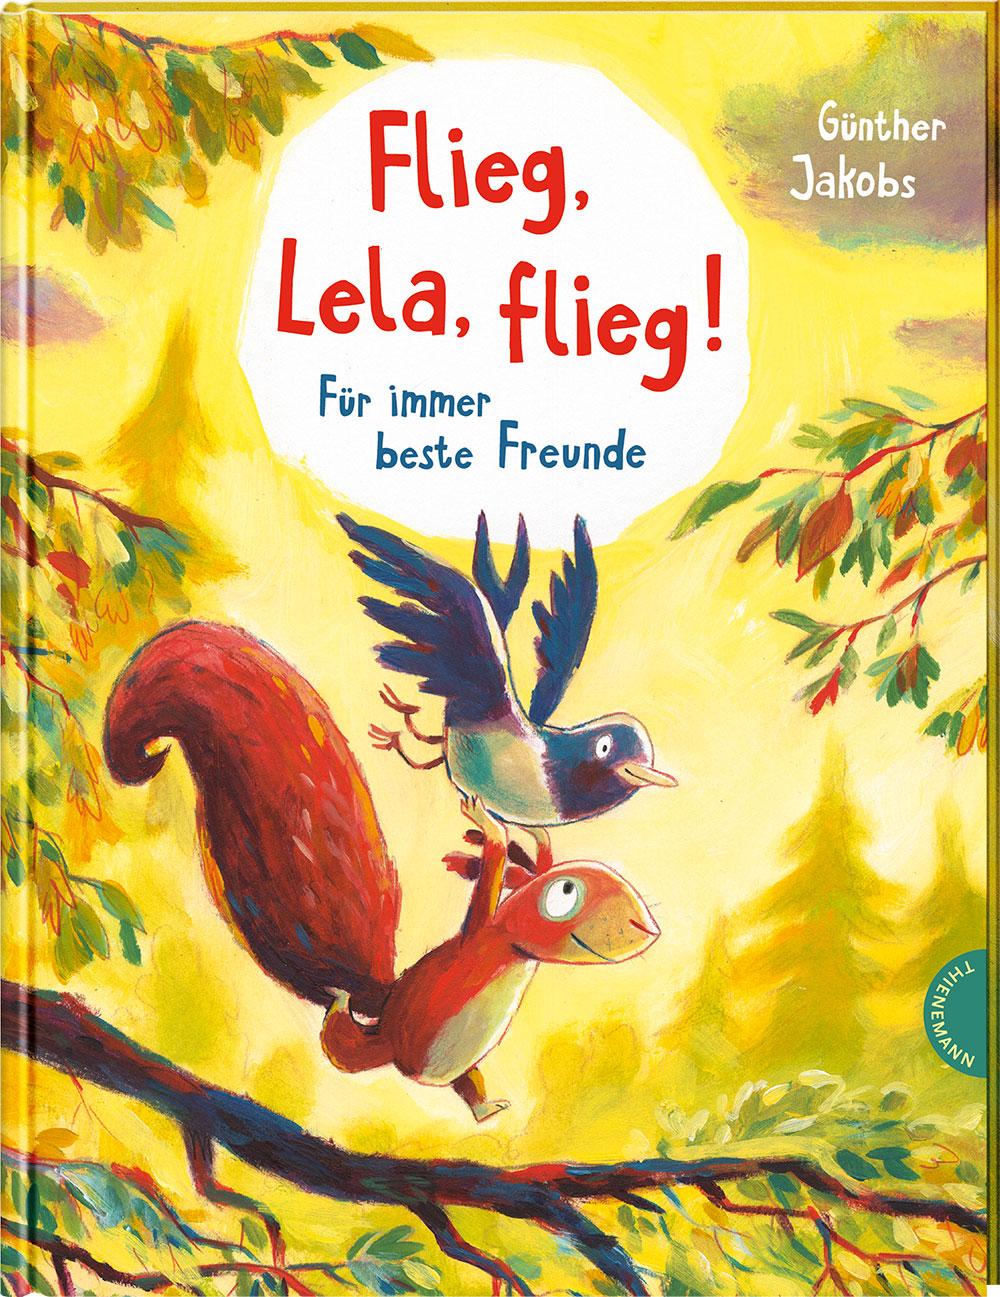 »FLIEG, LELA, FLIEG!« — THIENEMANN